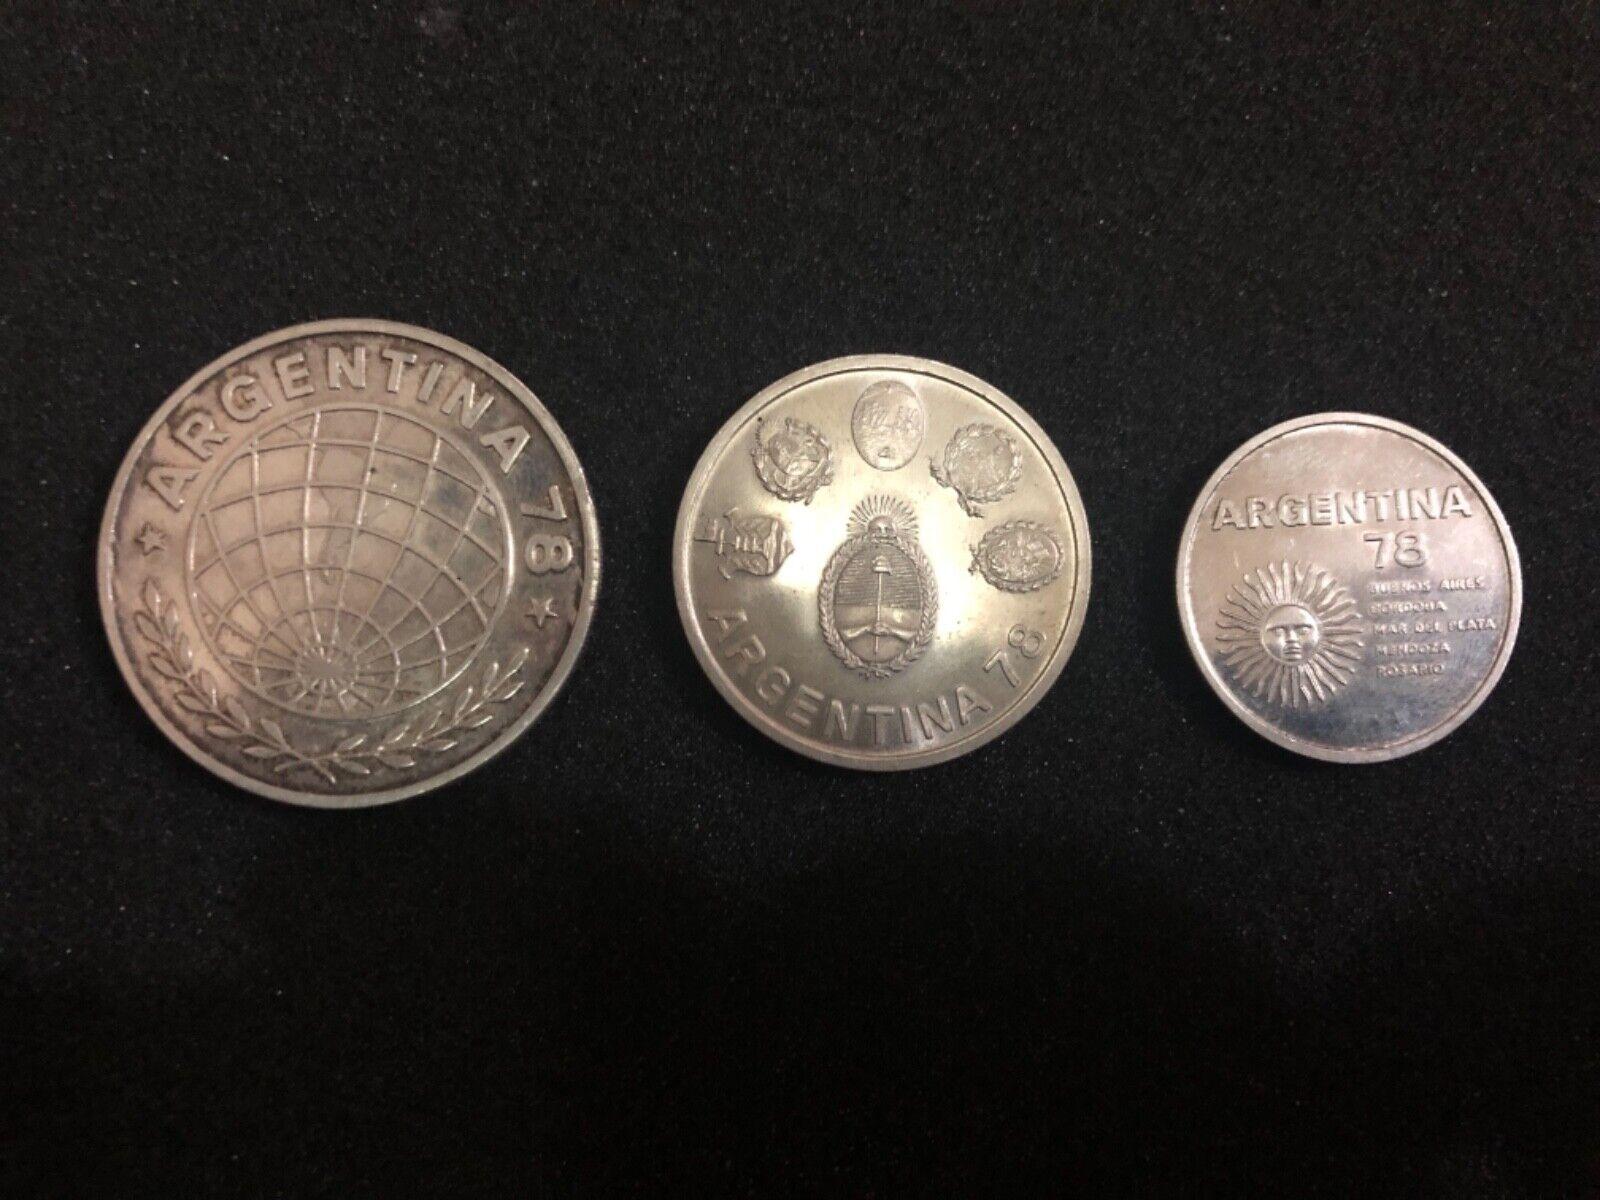 plataina WC 1978 Set 3 monedas de plata ahutectic